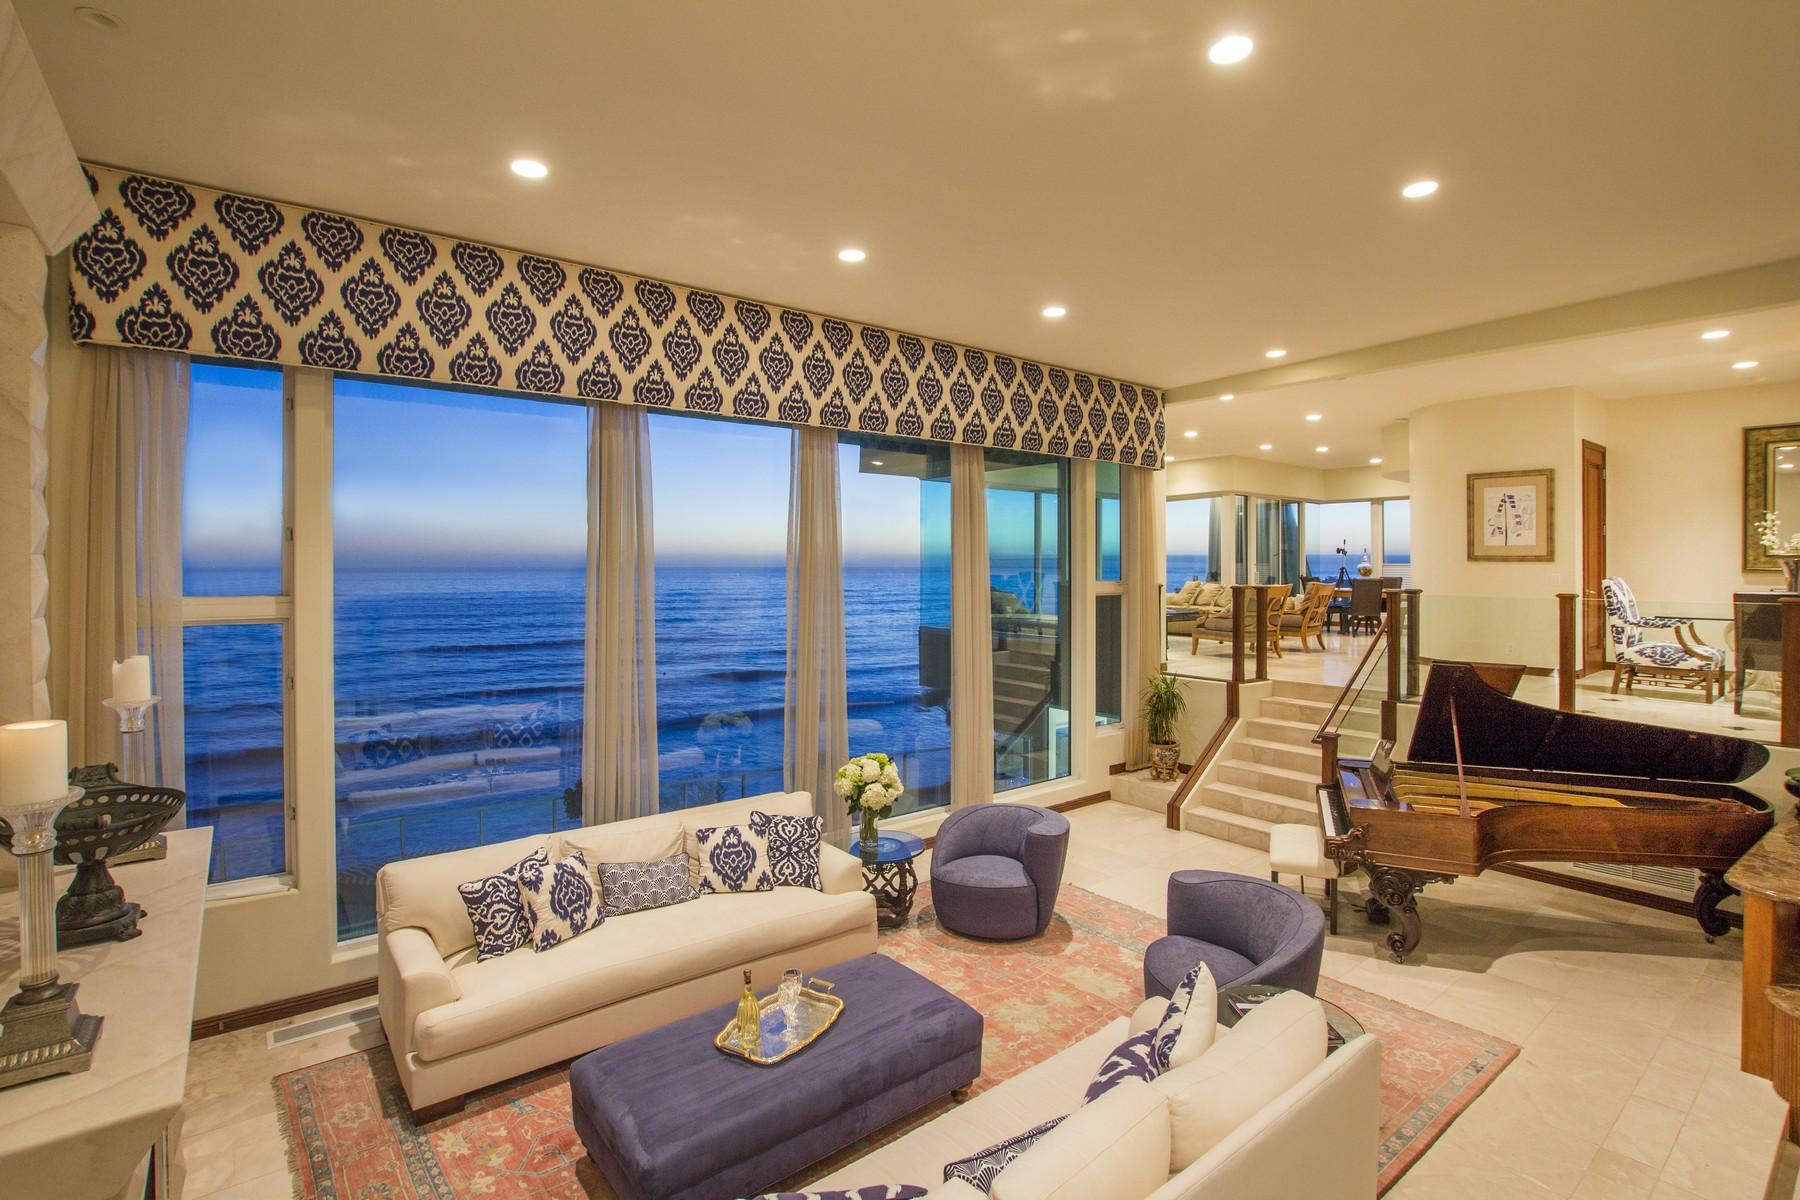 Single Family Home for Sale at 5212 Chelsea Street La Jolla, California 92037 United States